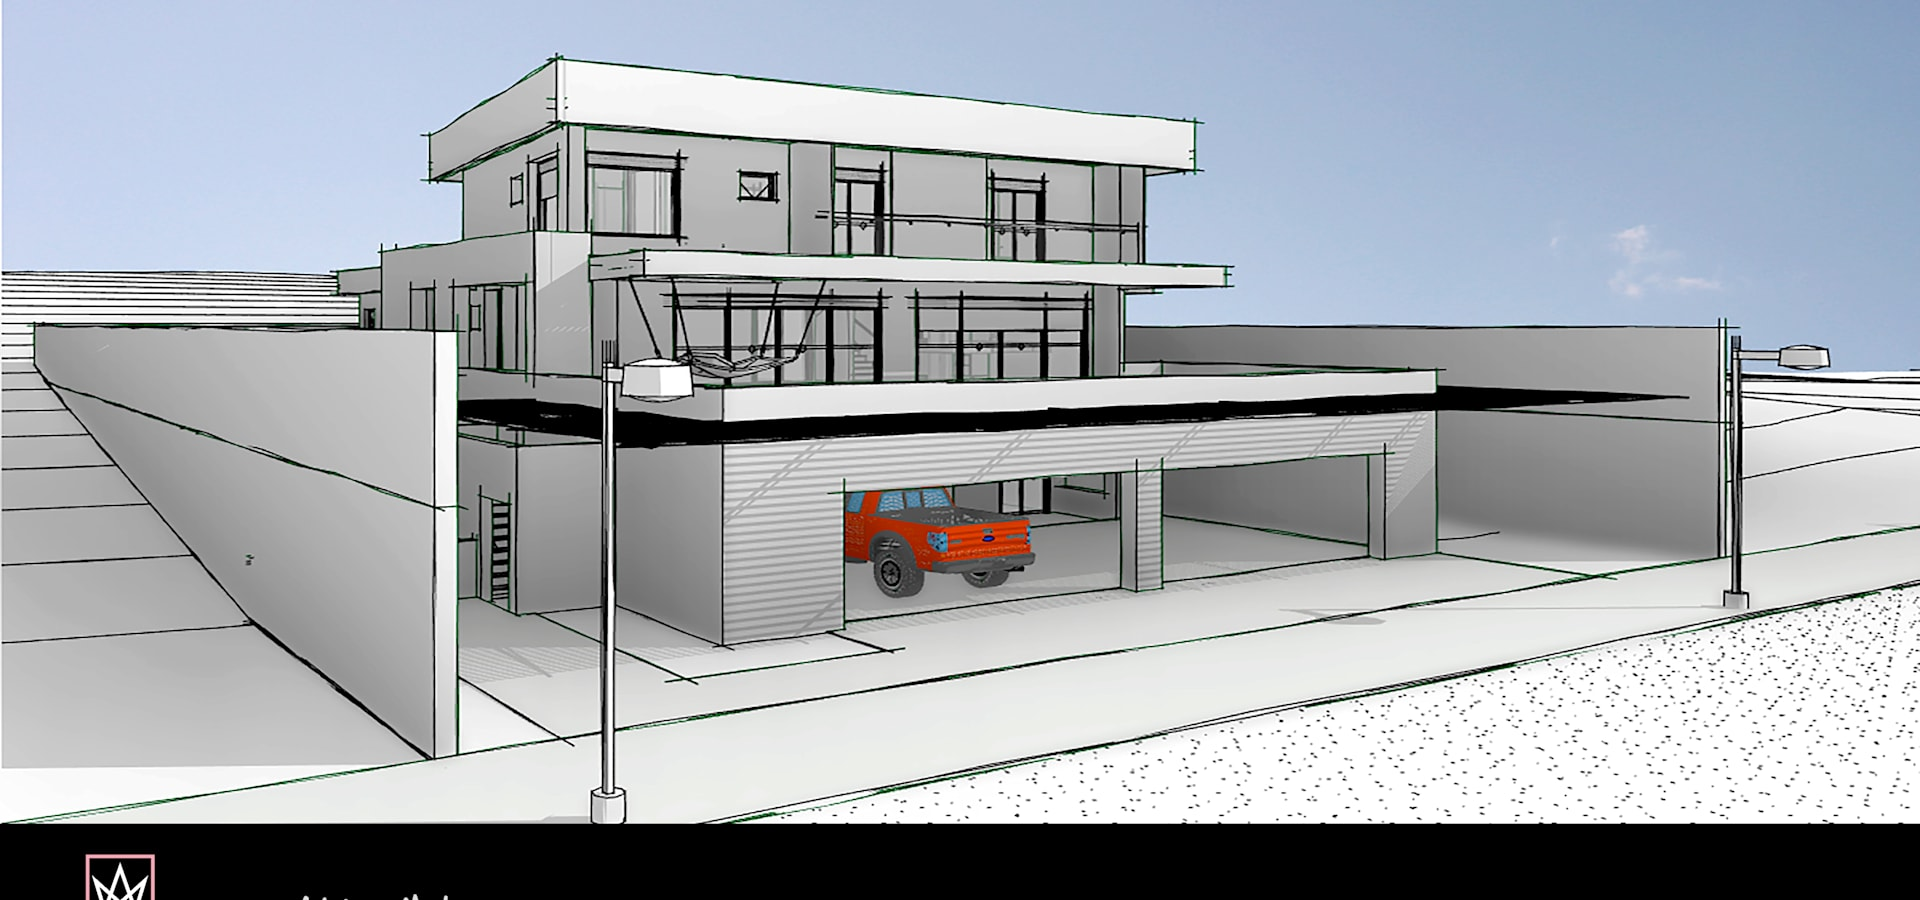 Arquitetura M—Arquitetura e Engenharia